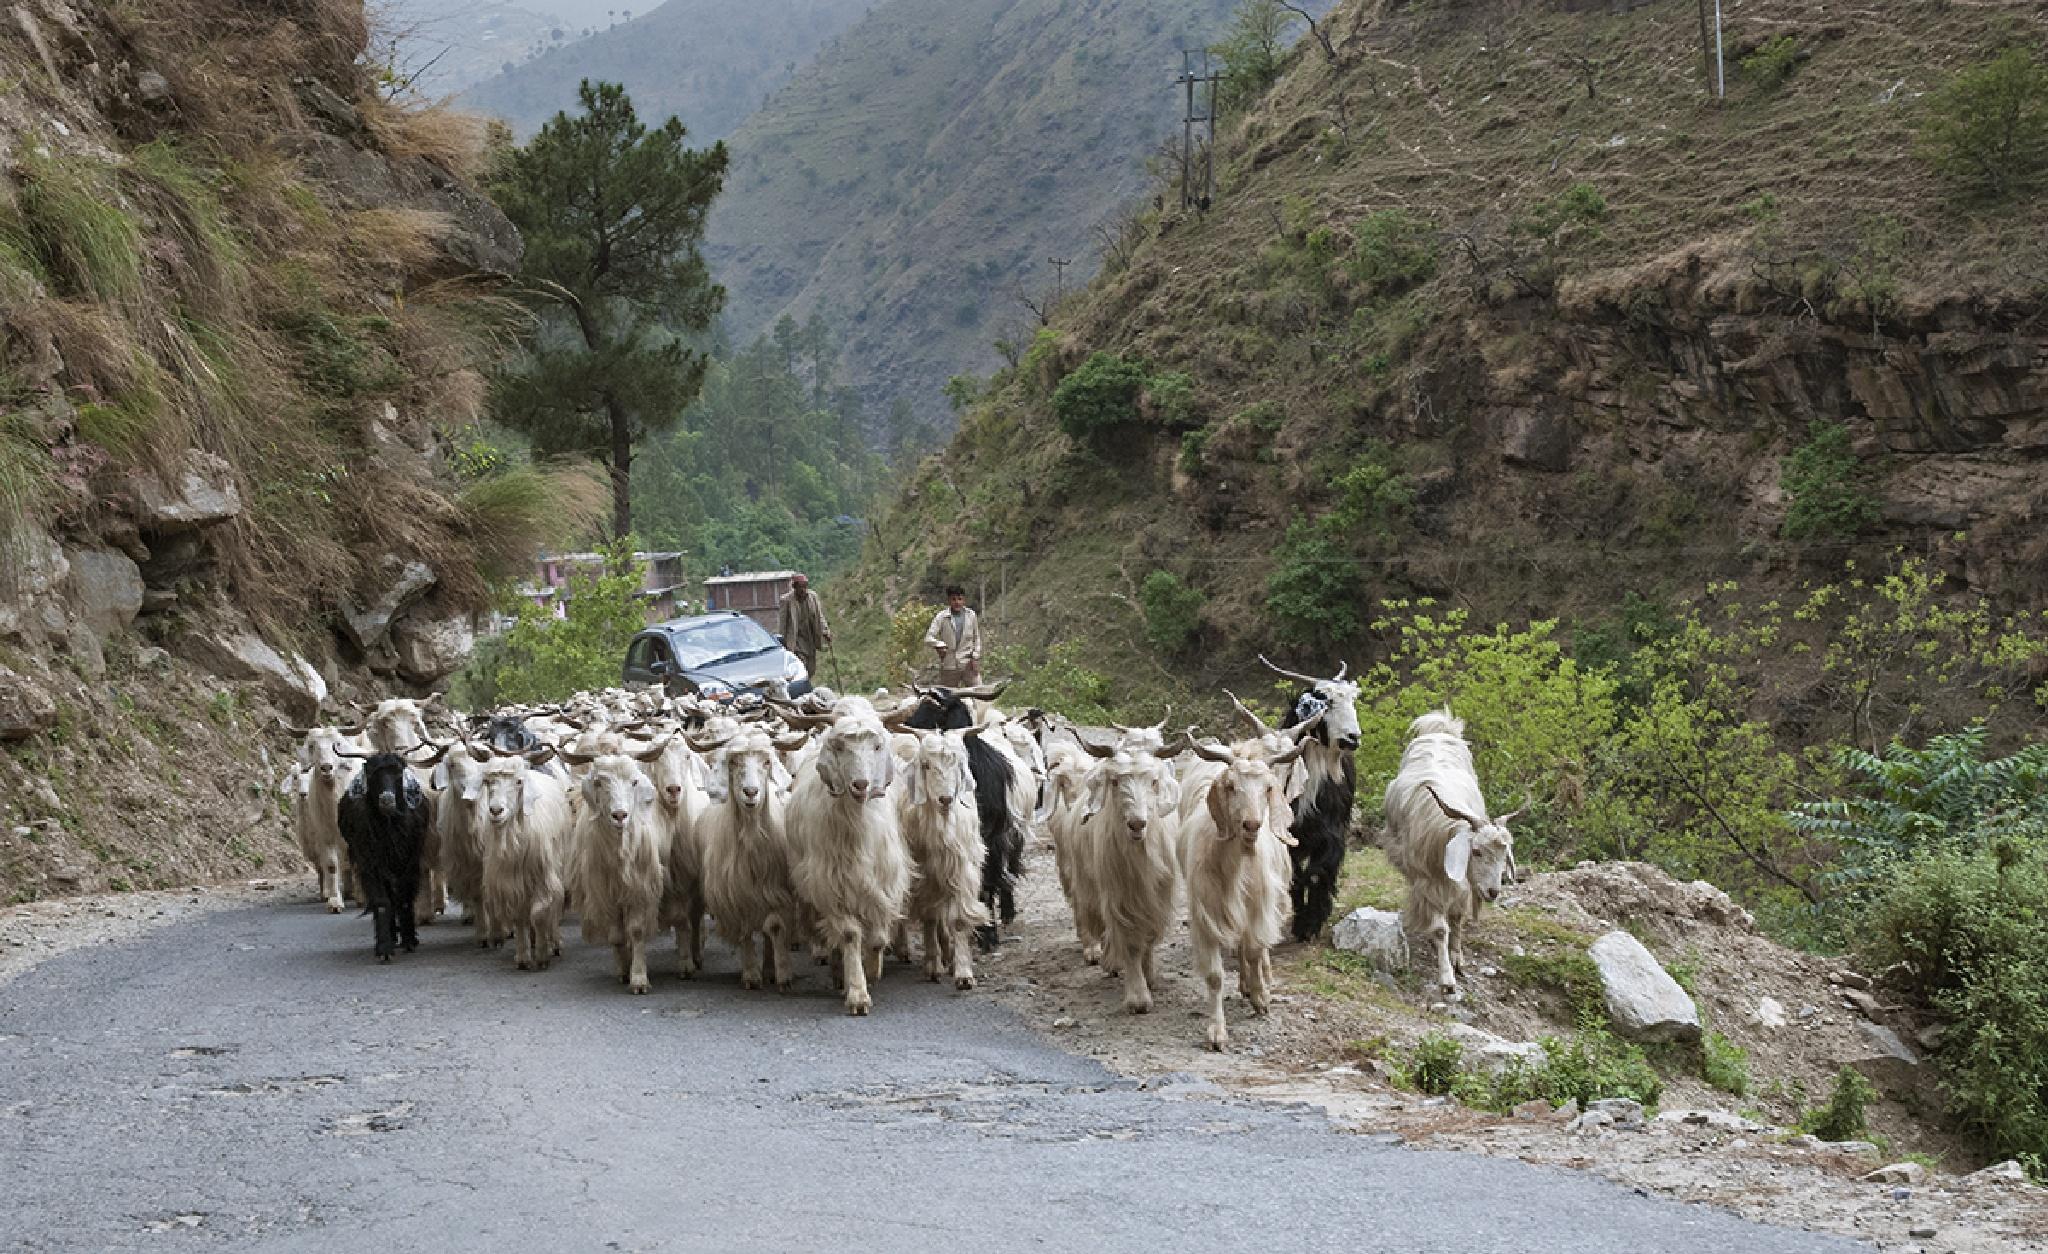 Traffic Jam by Saurabh Bhattacharyya